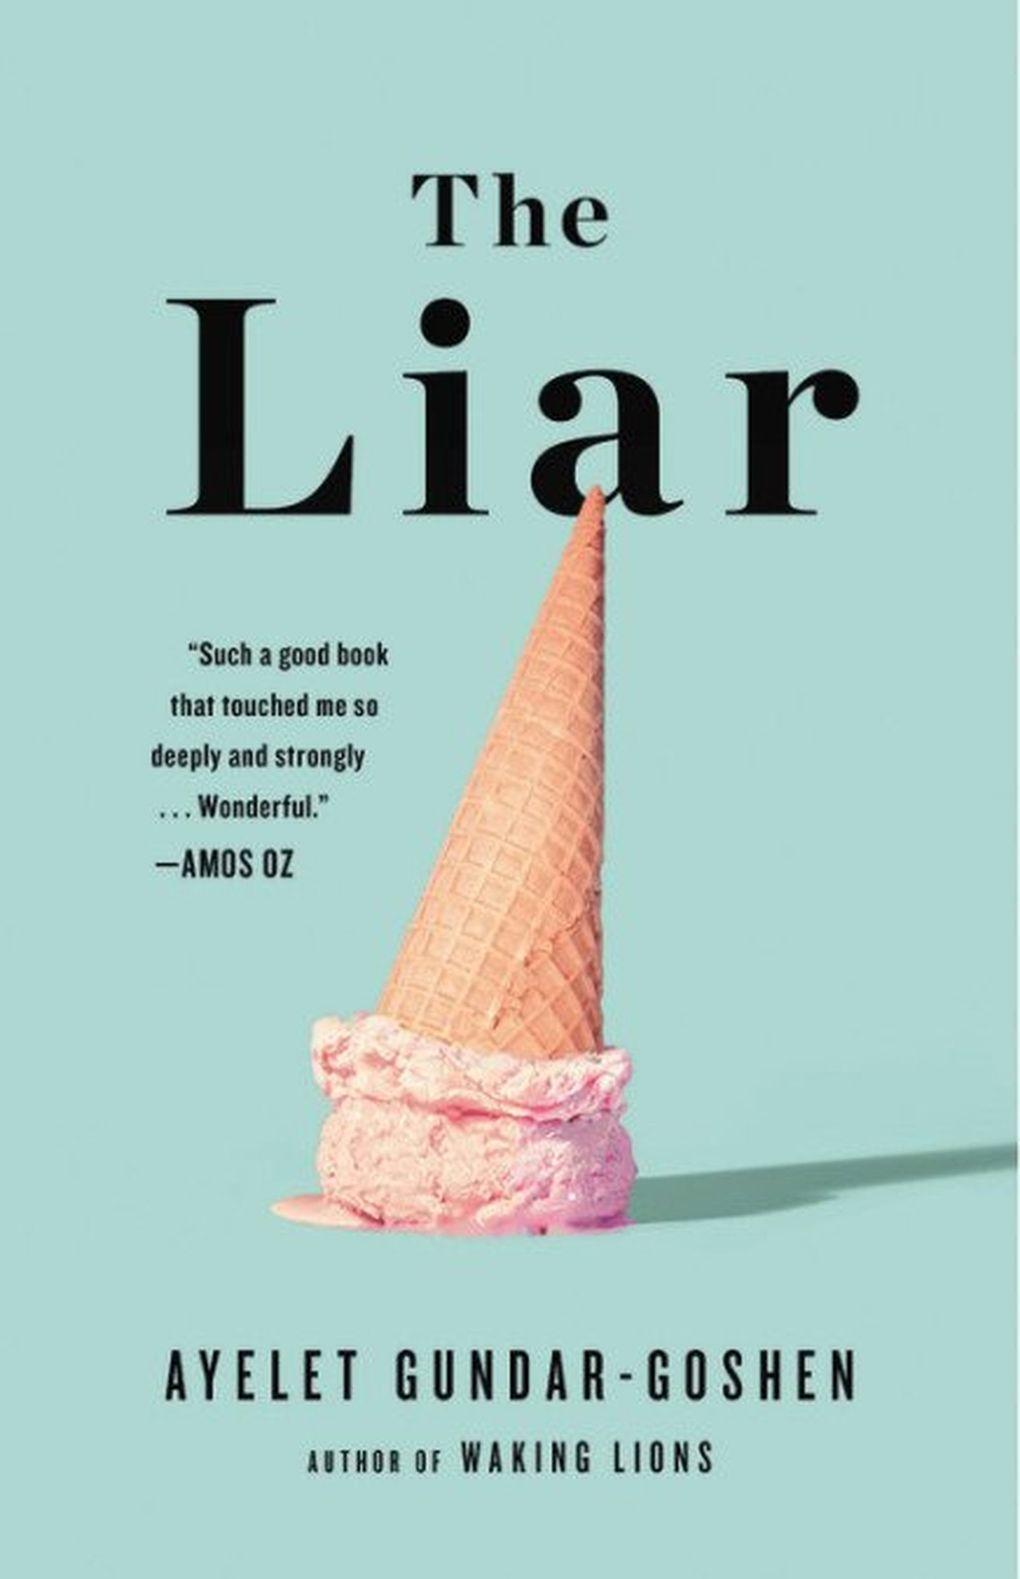 """The Liar"" by Ayelet Gundar-Goshen (Little, Brown)"